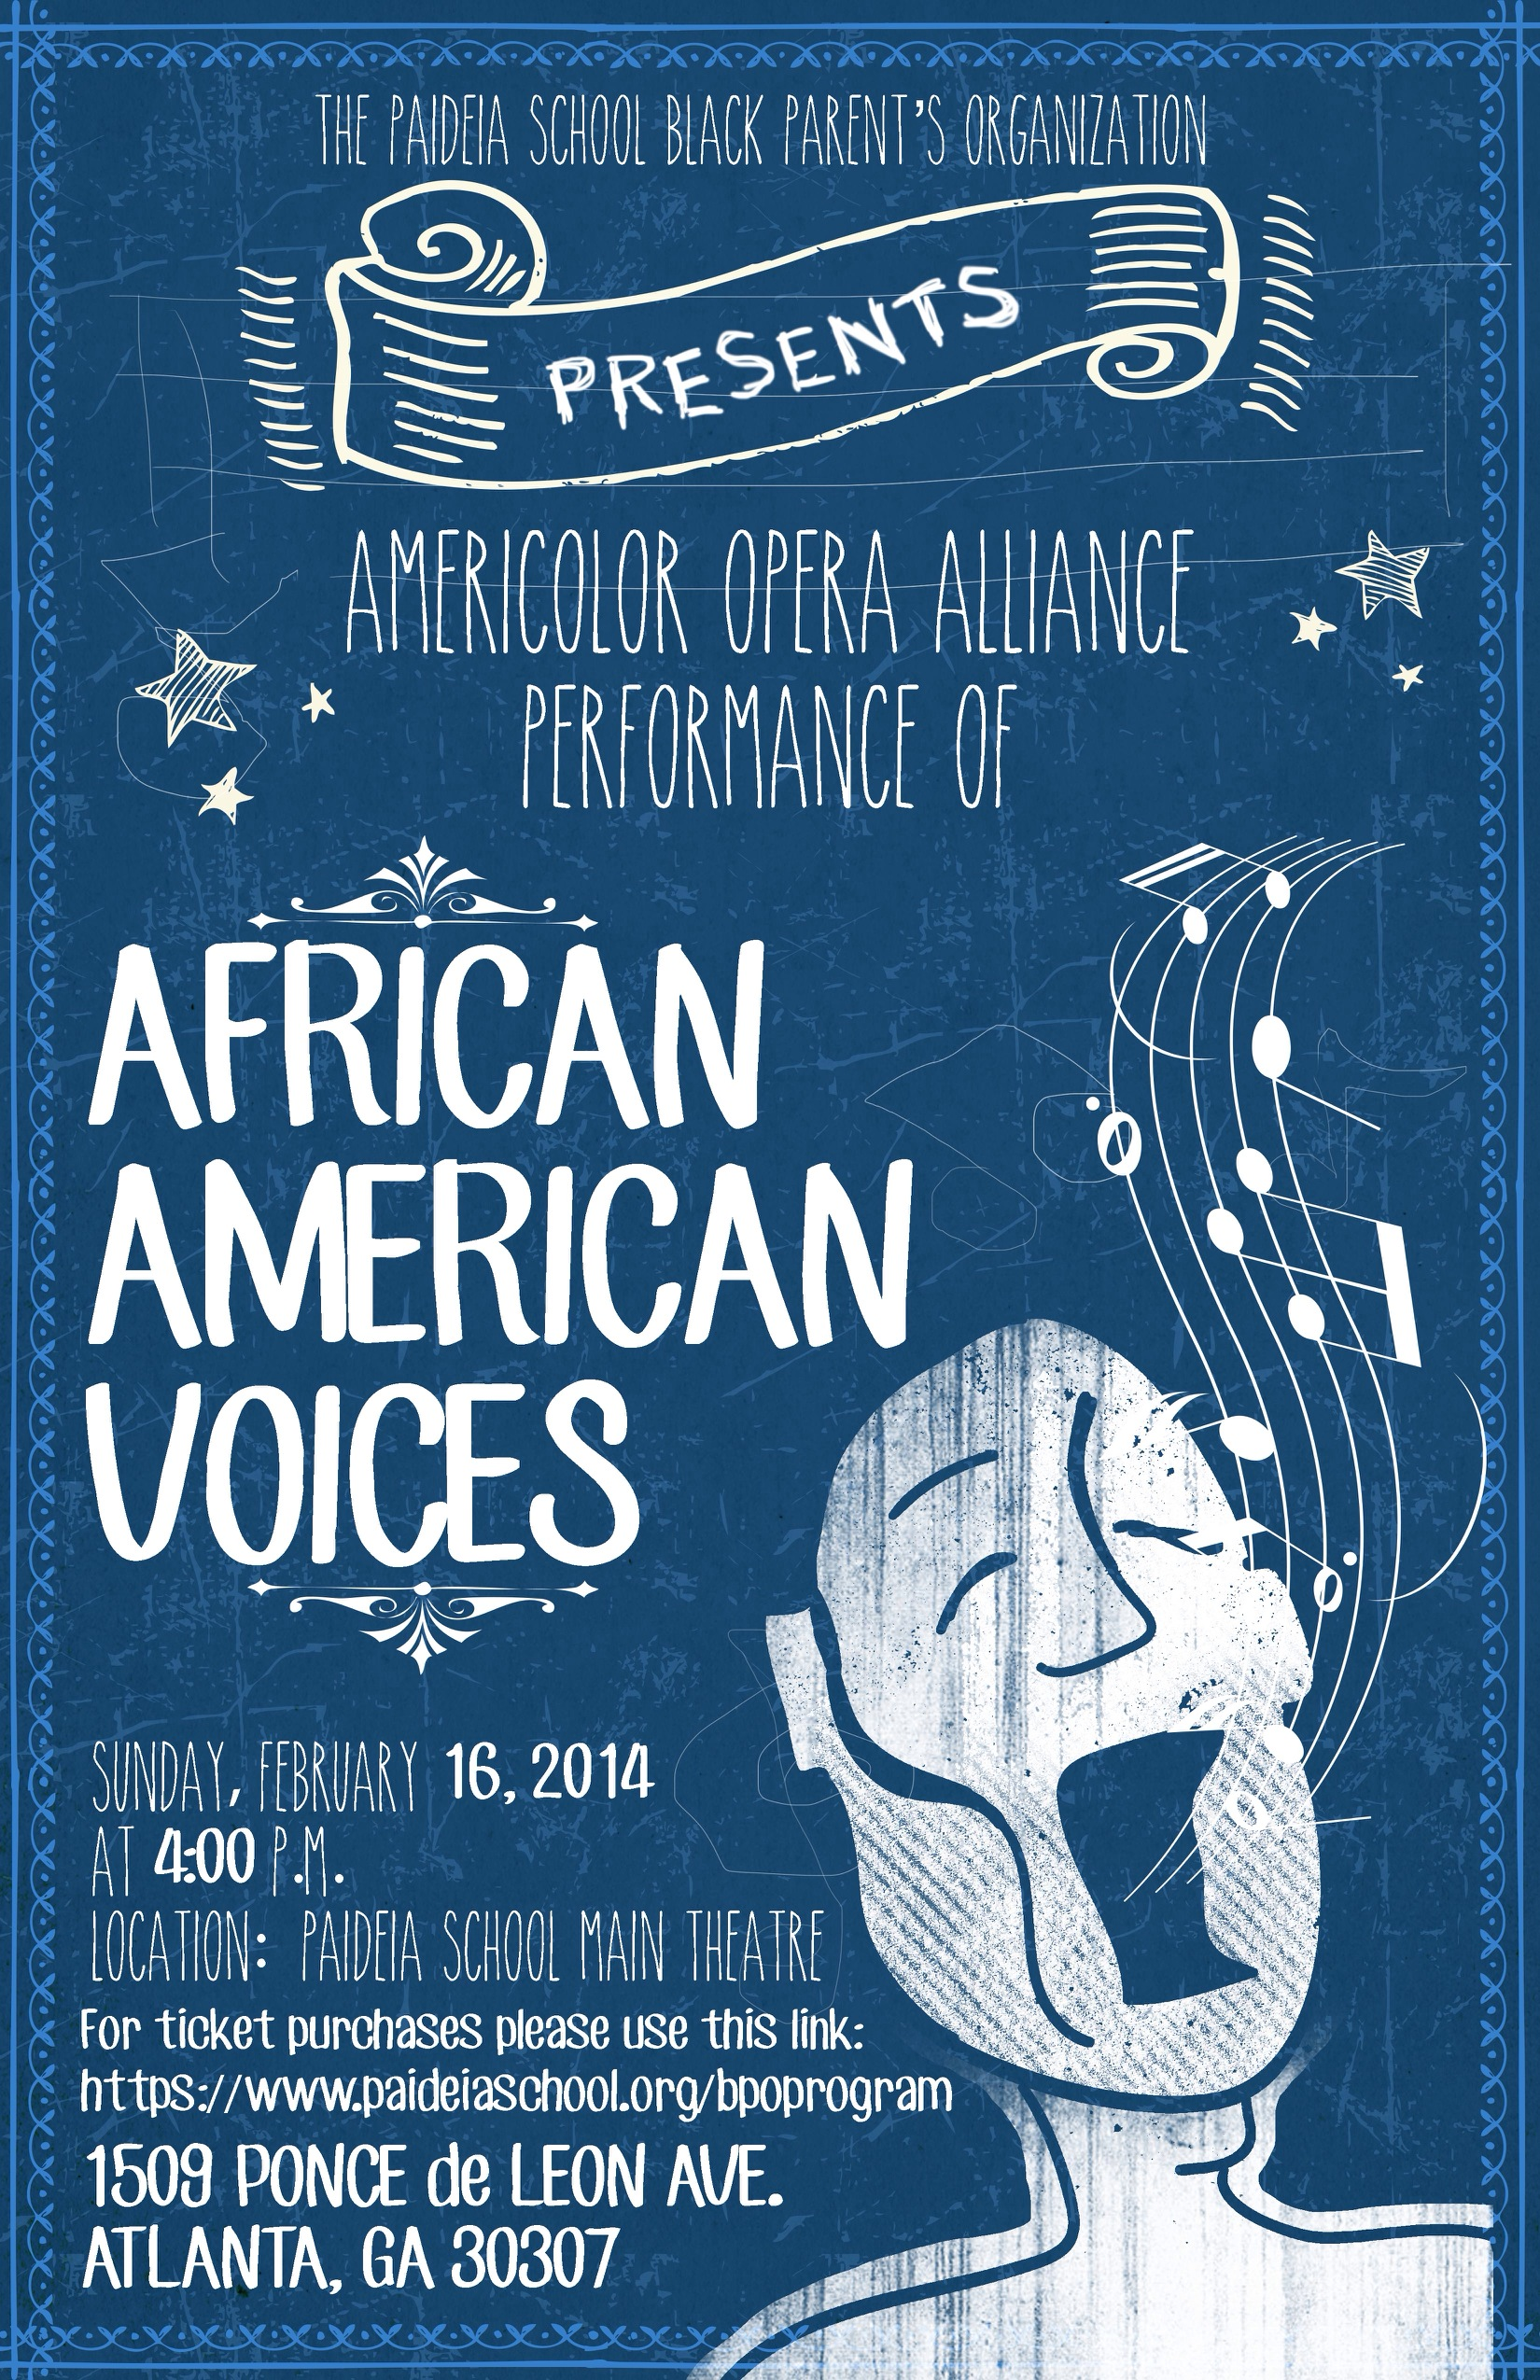 Leslie_AfricanAmericanVoices_v03